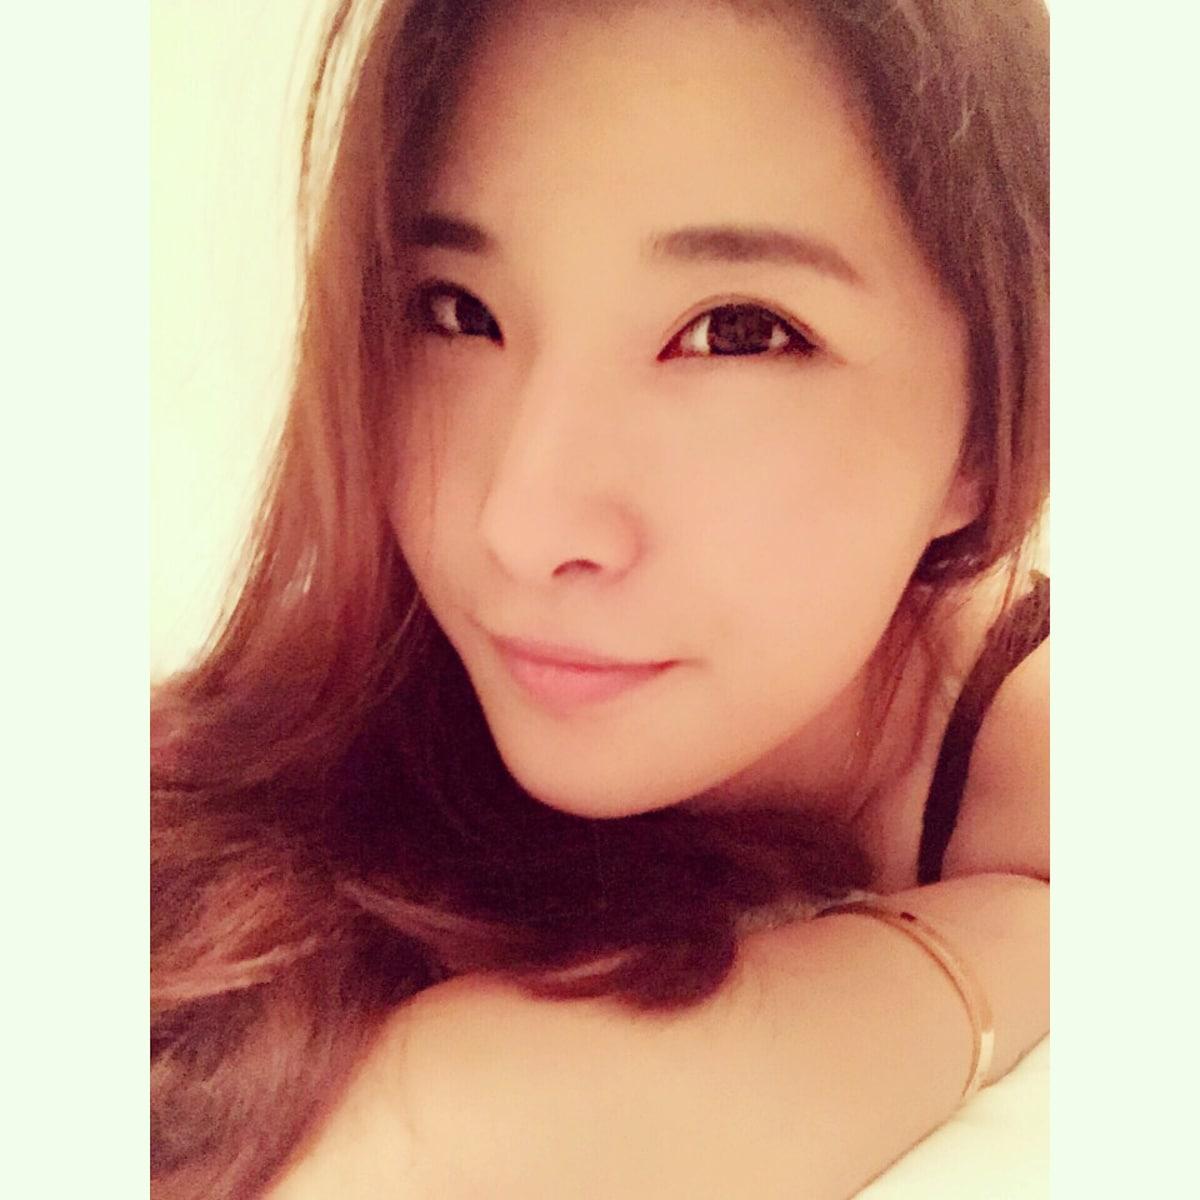 Jiayi from New York